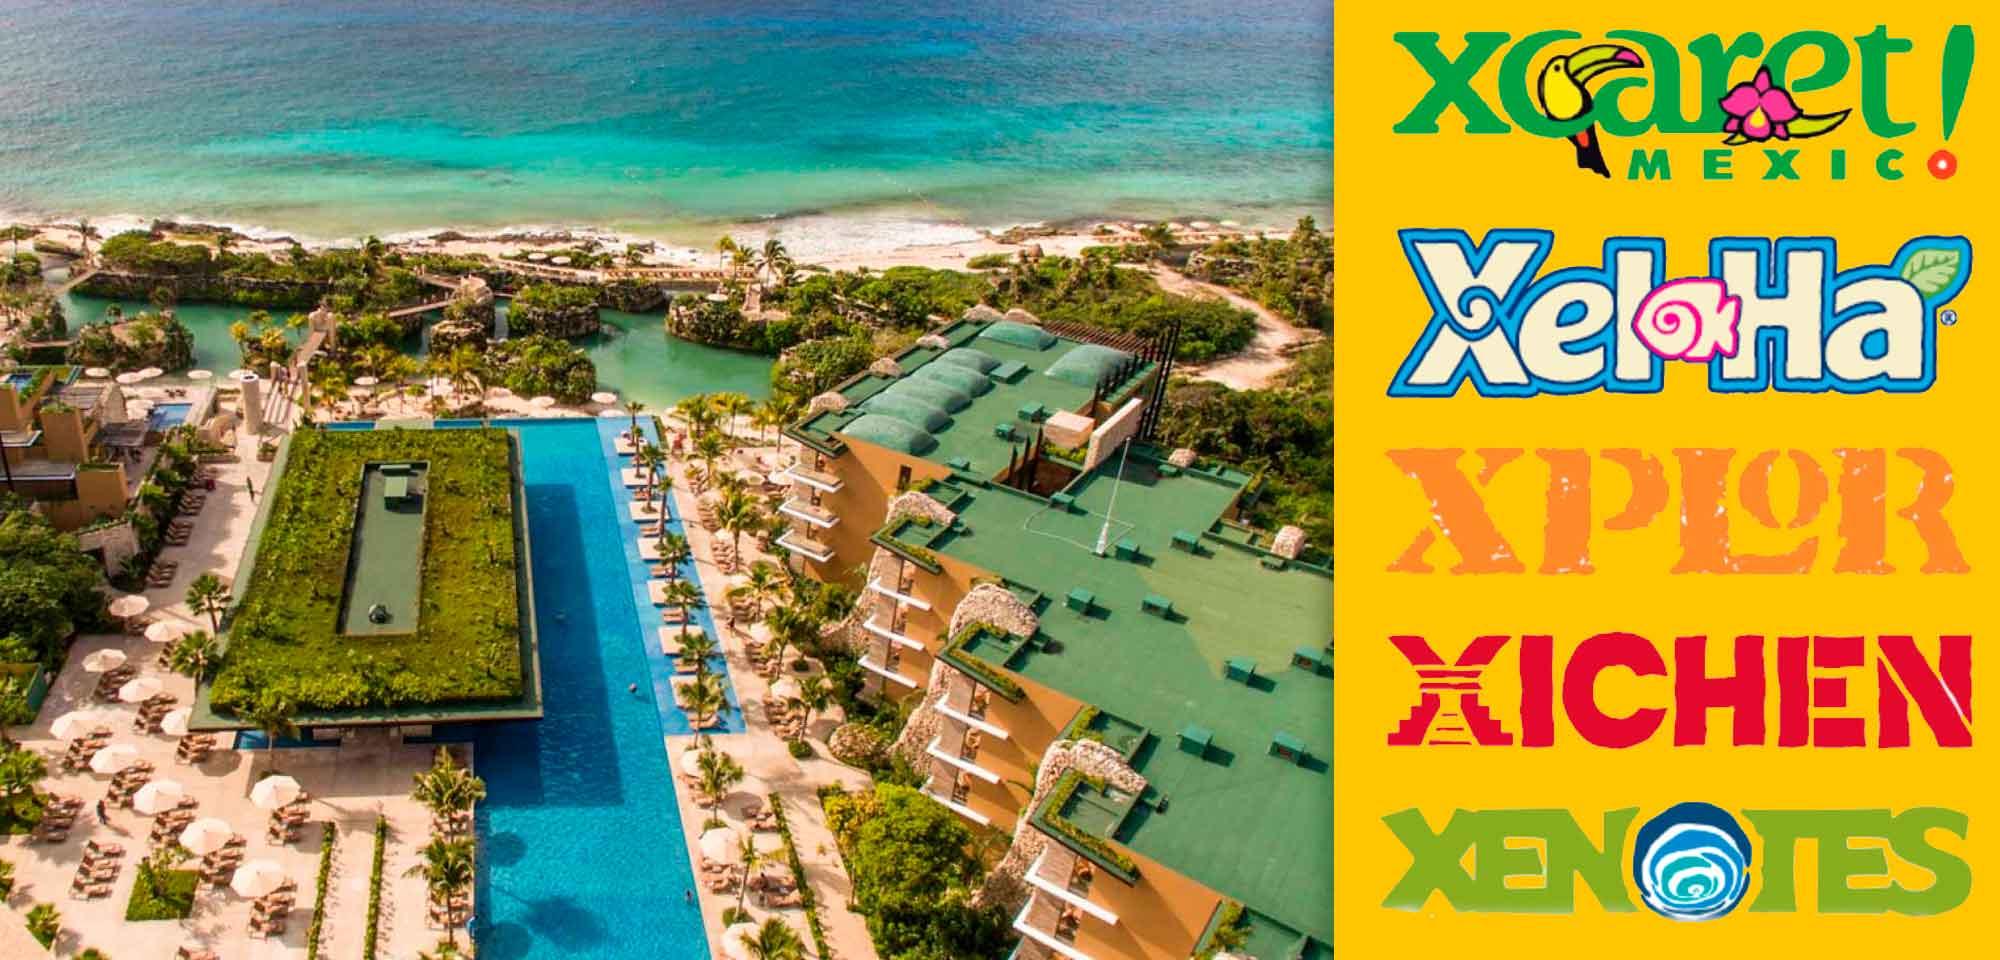 Paquetes de viajes a México